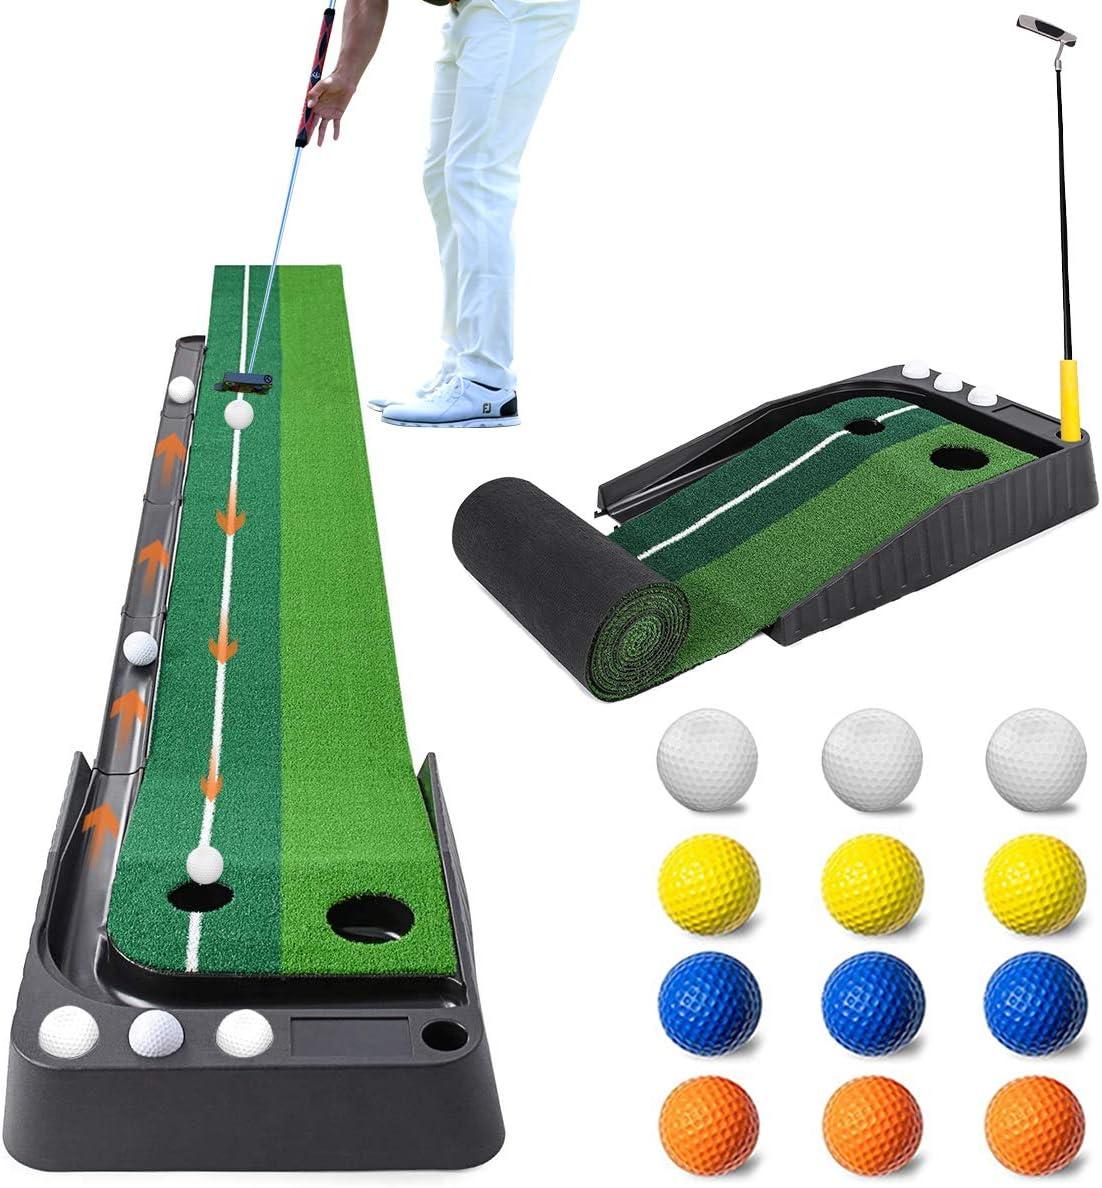 Aliennana Golf Putting Green Mat with Auto Ball Return,Golf Practice Training Aid,Extra Long 9.84Feet,Pro Indoor/Outdoor Putting Green with 12 Bonus Balls Foldable Golf Mats